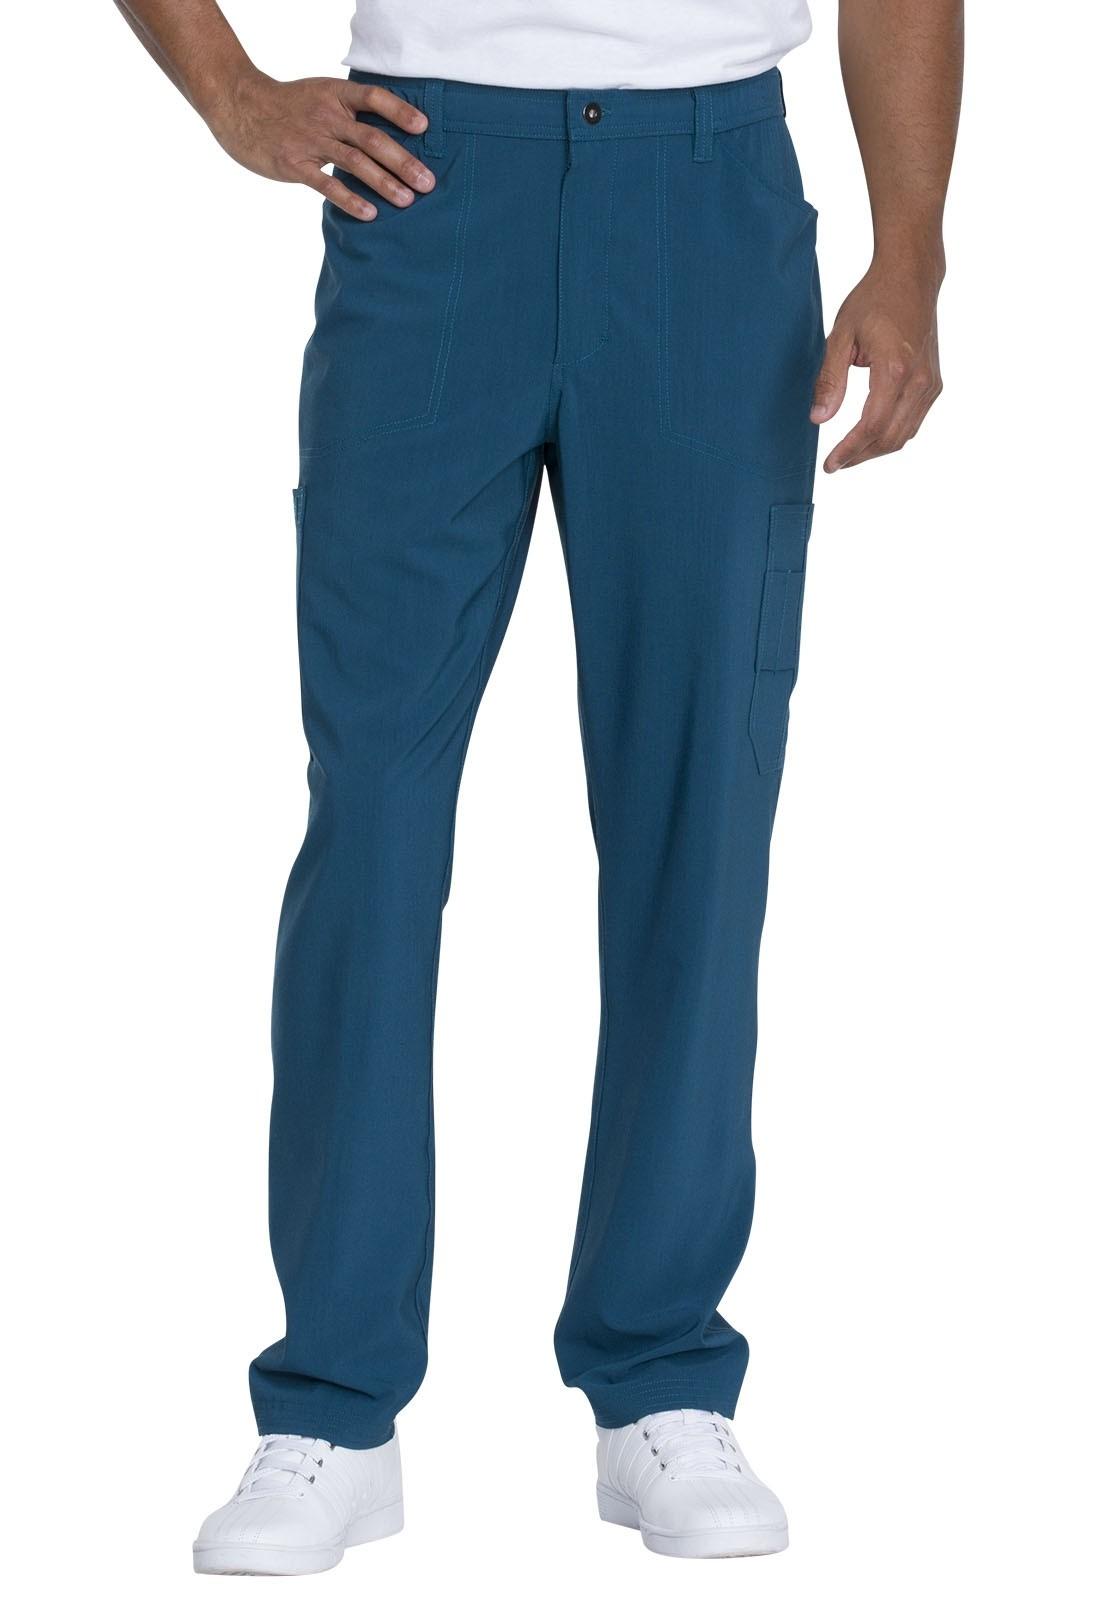 Dickies Men's Straight Leg Zip Fly Cargo Pant #DK205S